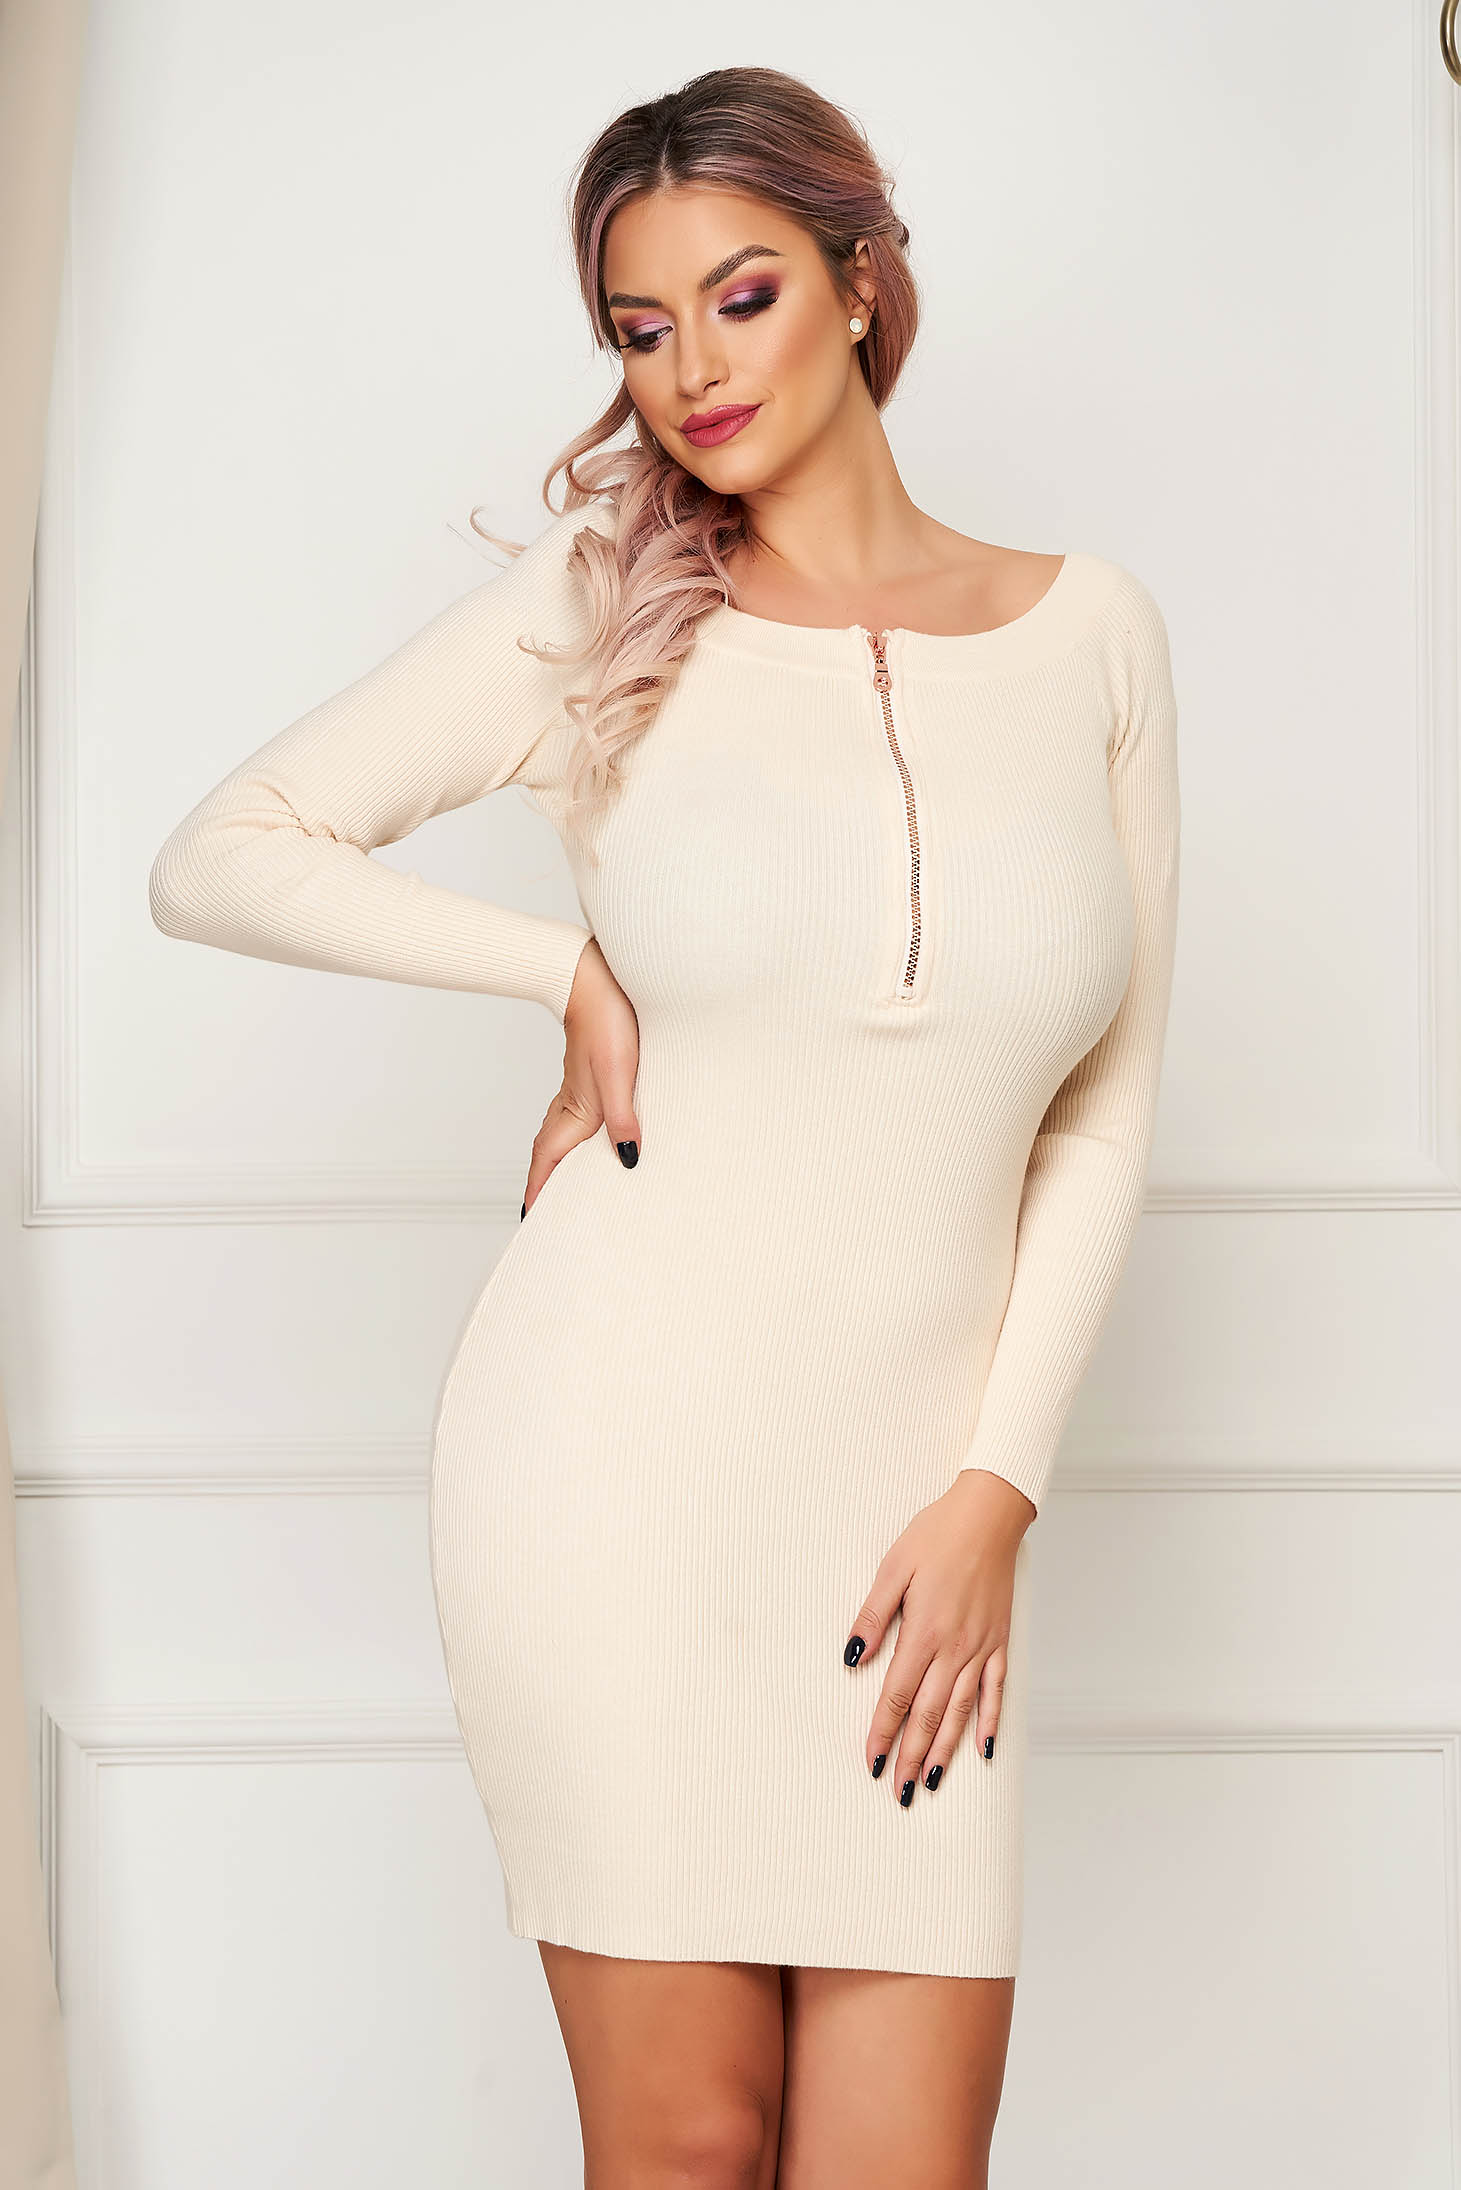 Cream dress short cut daily pencil knitted zipper accessory